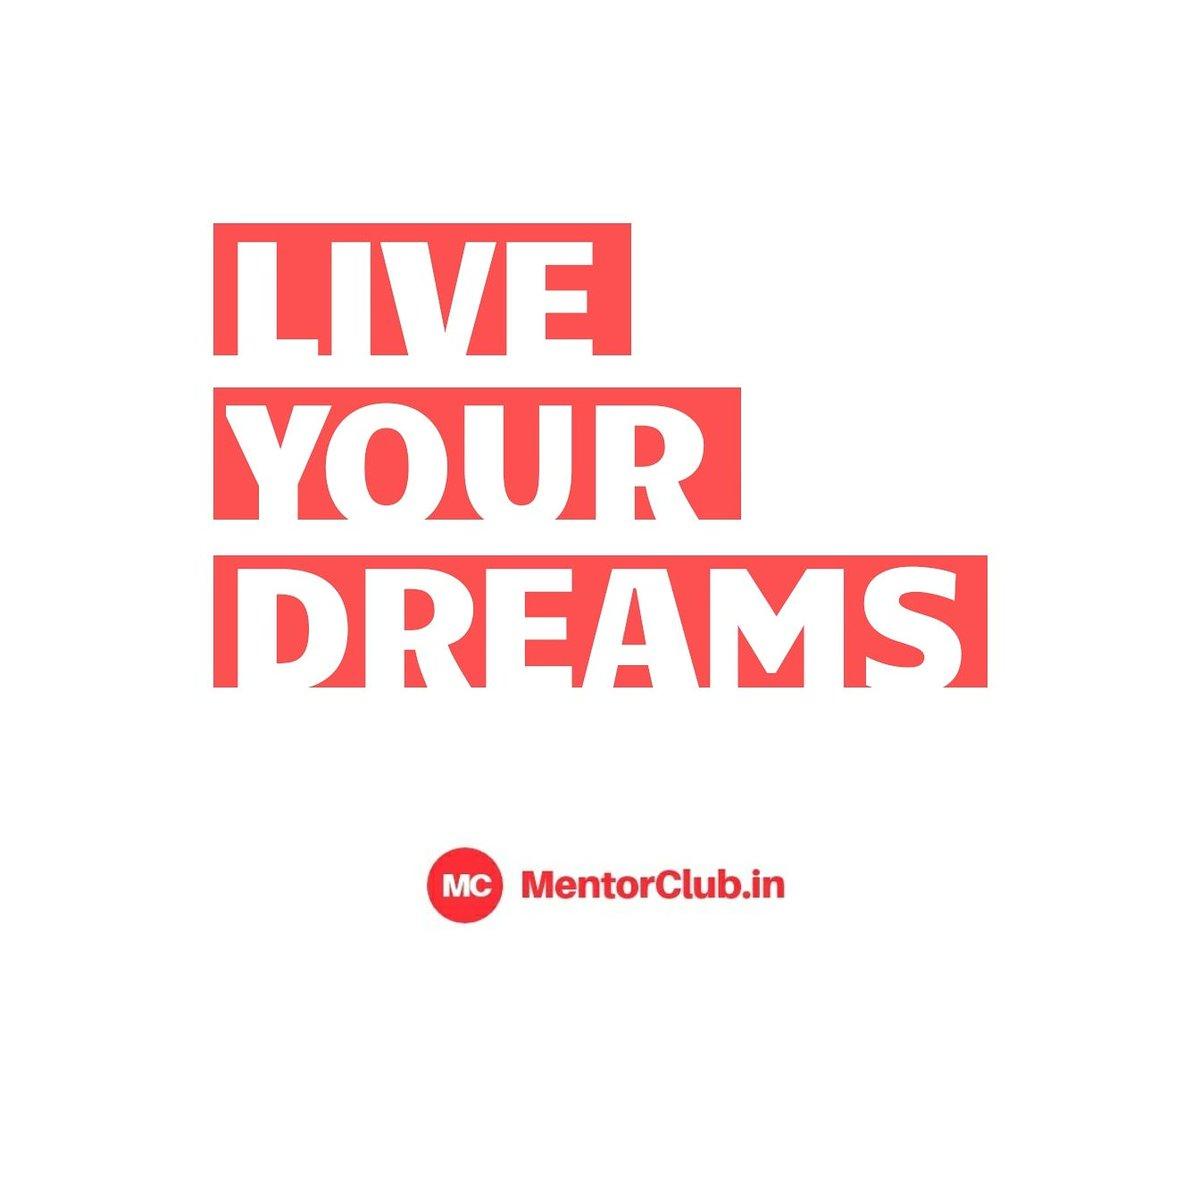 #mentor #mentorclub #career #careerguidance #life #job #work #hustle #careeradvicepic.twitter.com/MVoUM7KchV